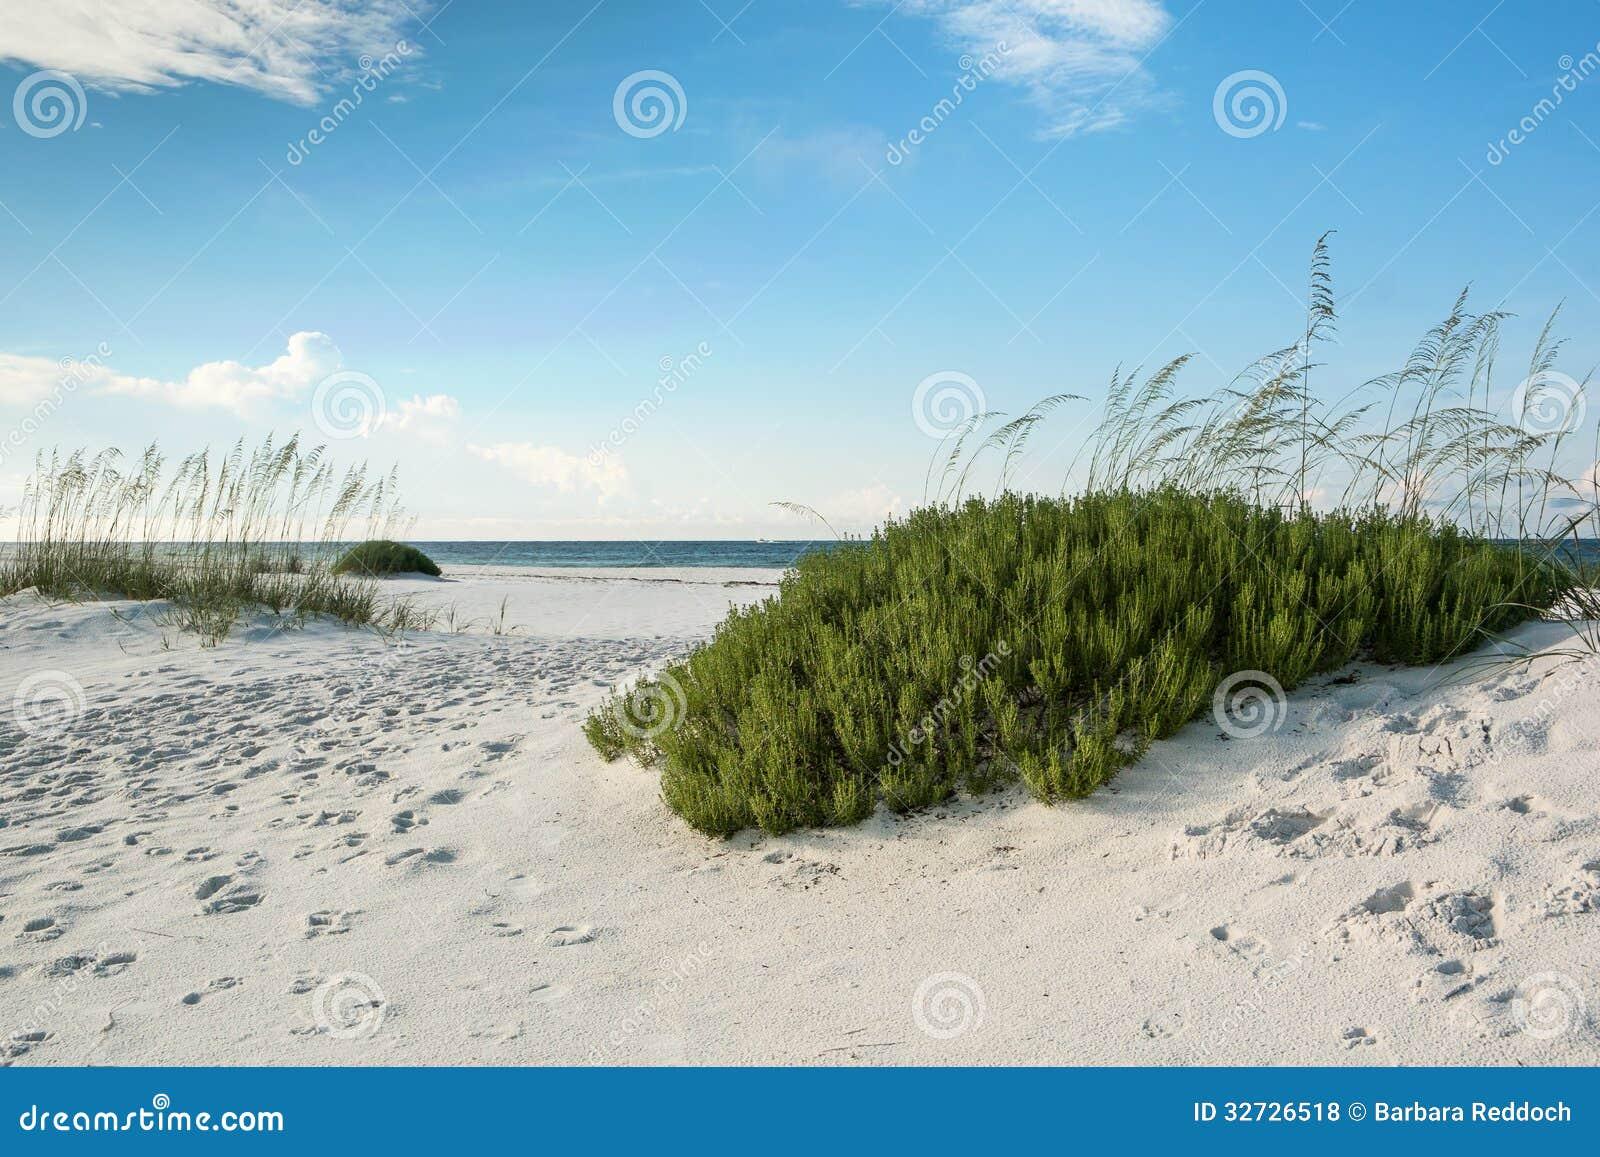 Florida Beach With Beach Rosemary Stock Photo Image